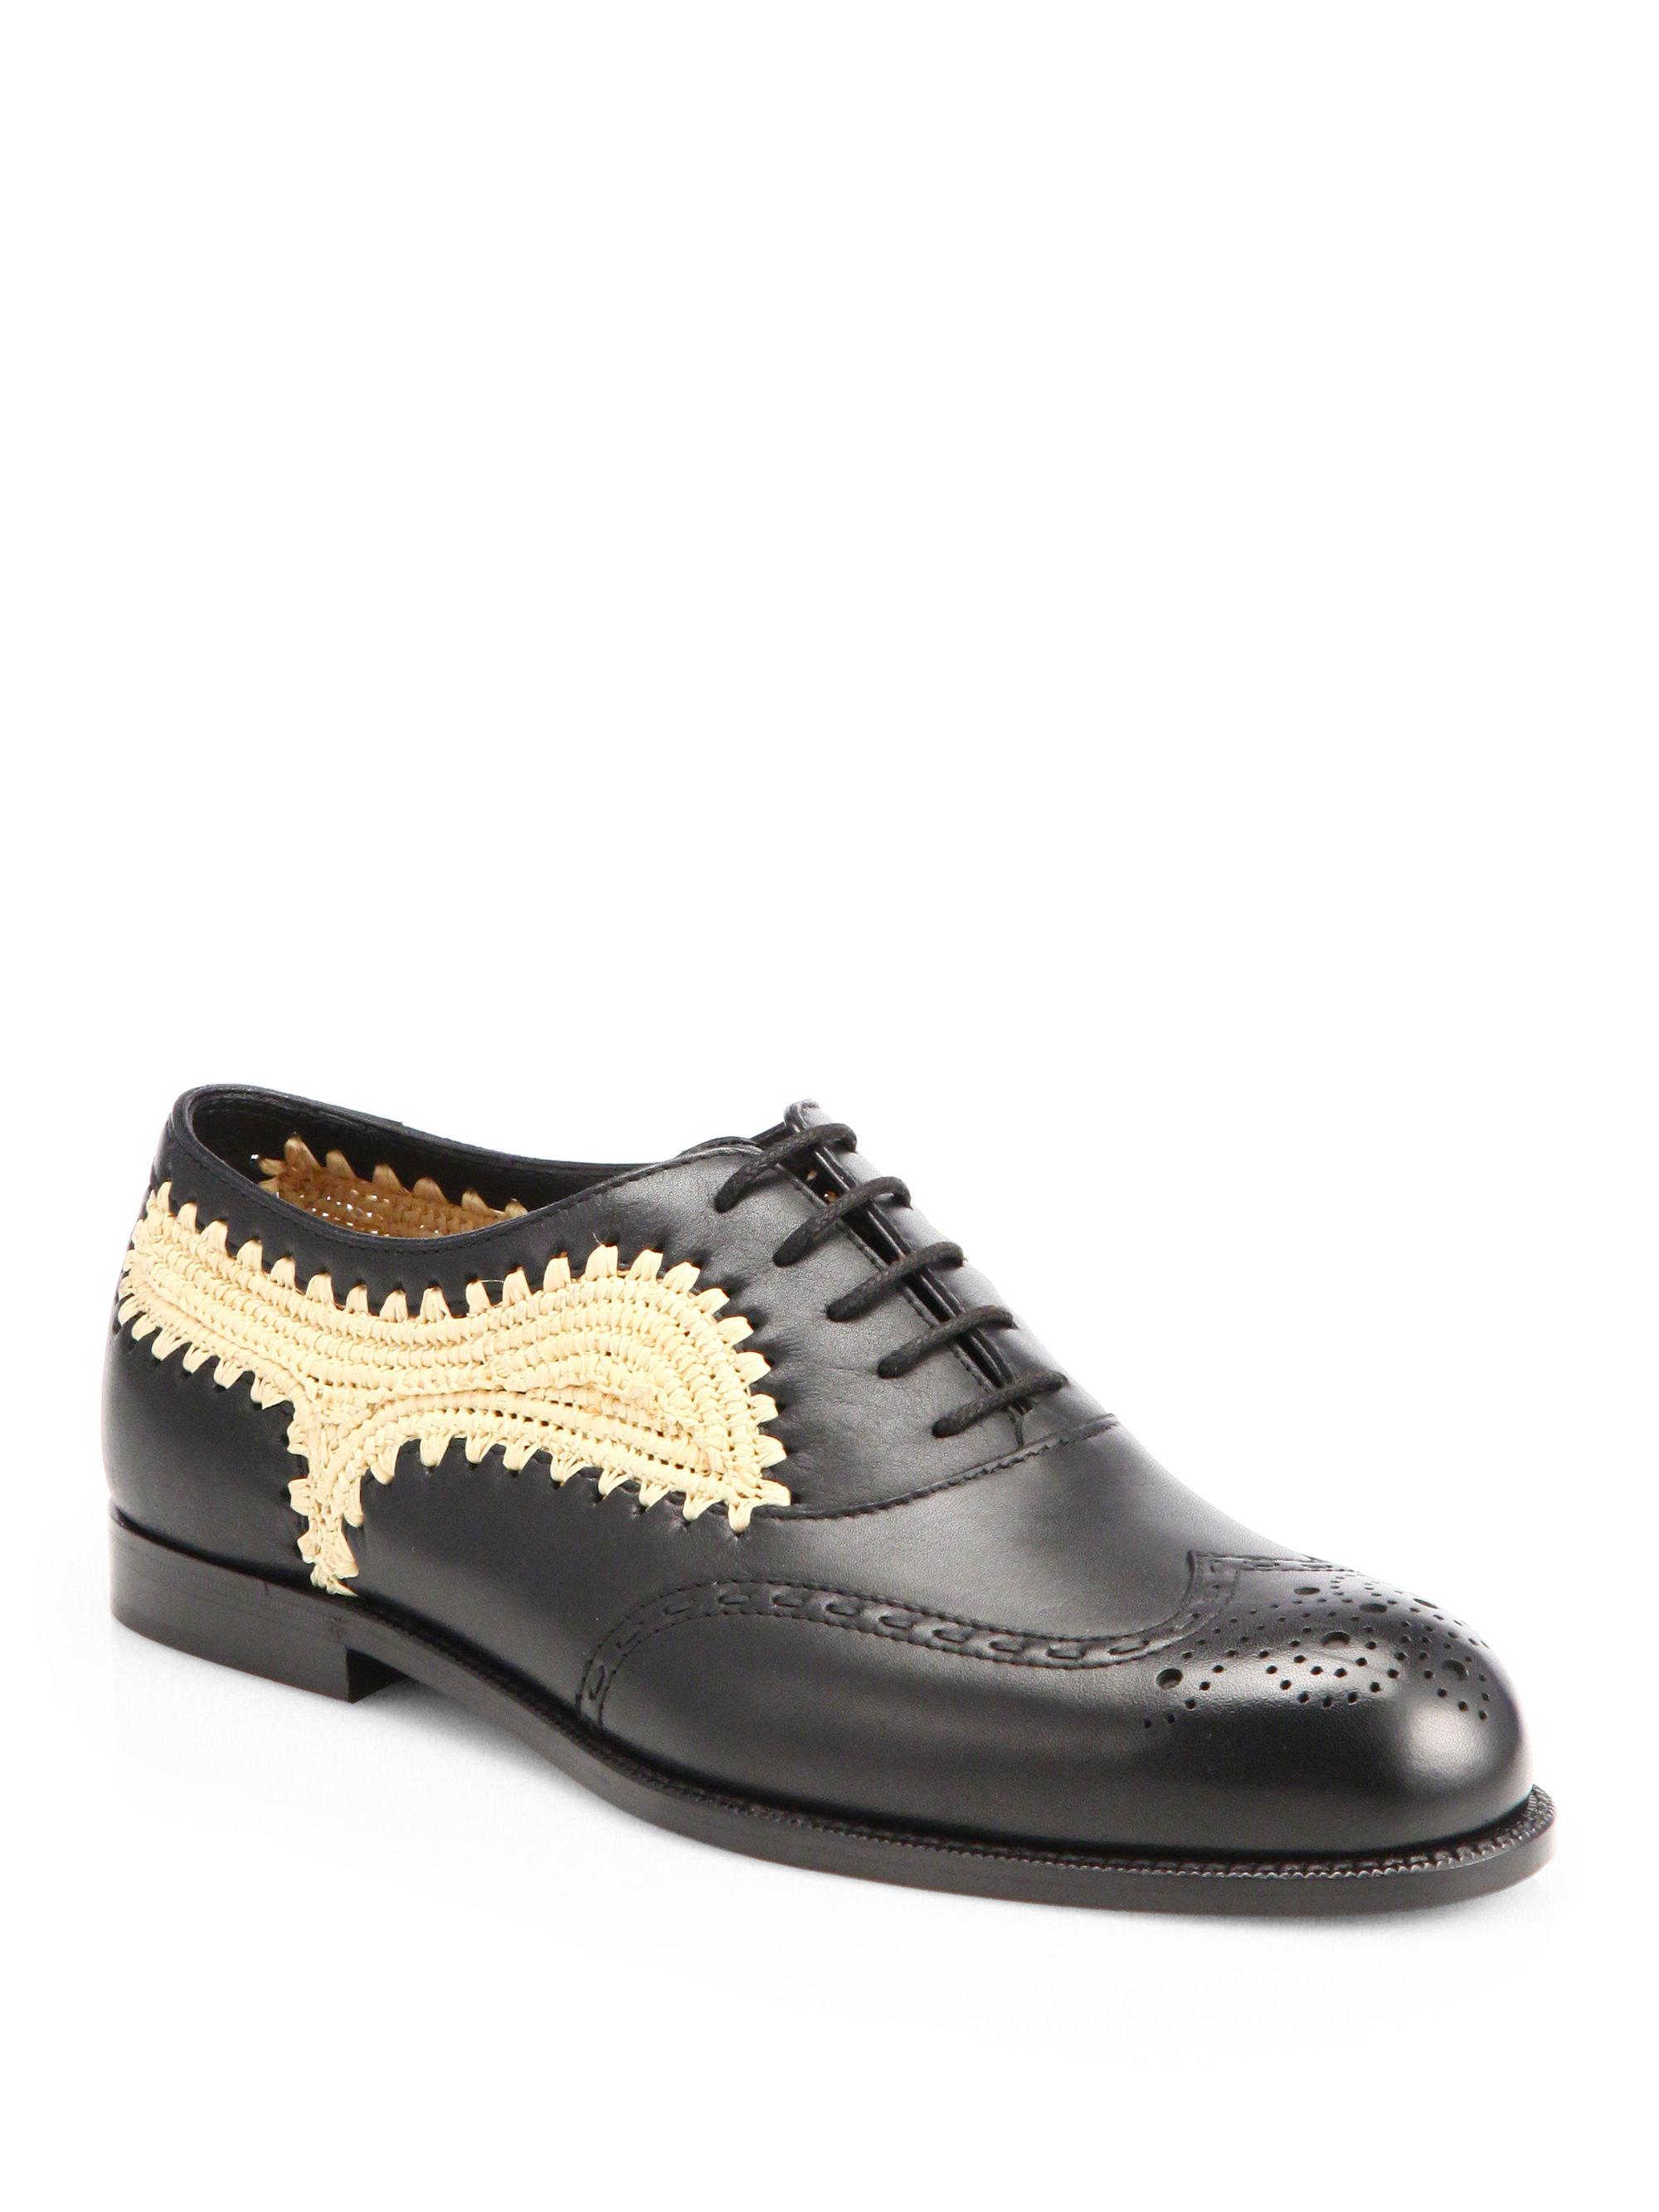 Define Oxford Shoes - 28 Images - Oxford Shoes Definition 28 Images Dress Like A Ballet Flat ...